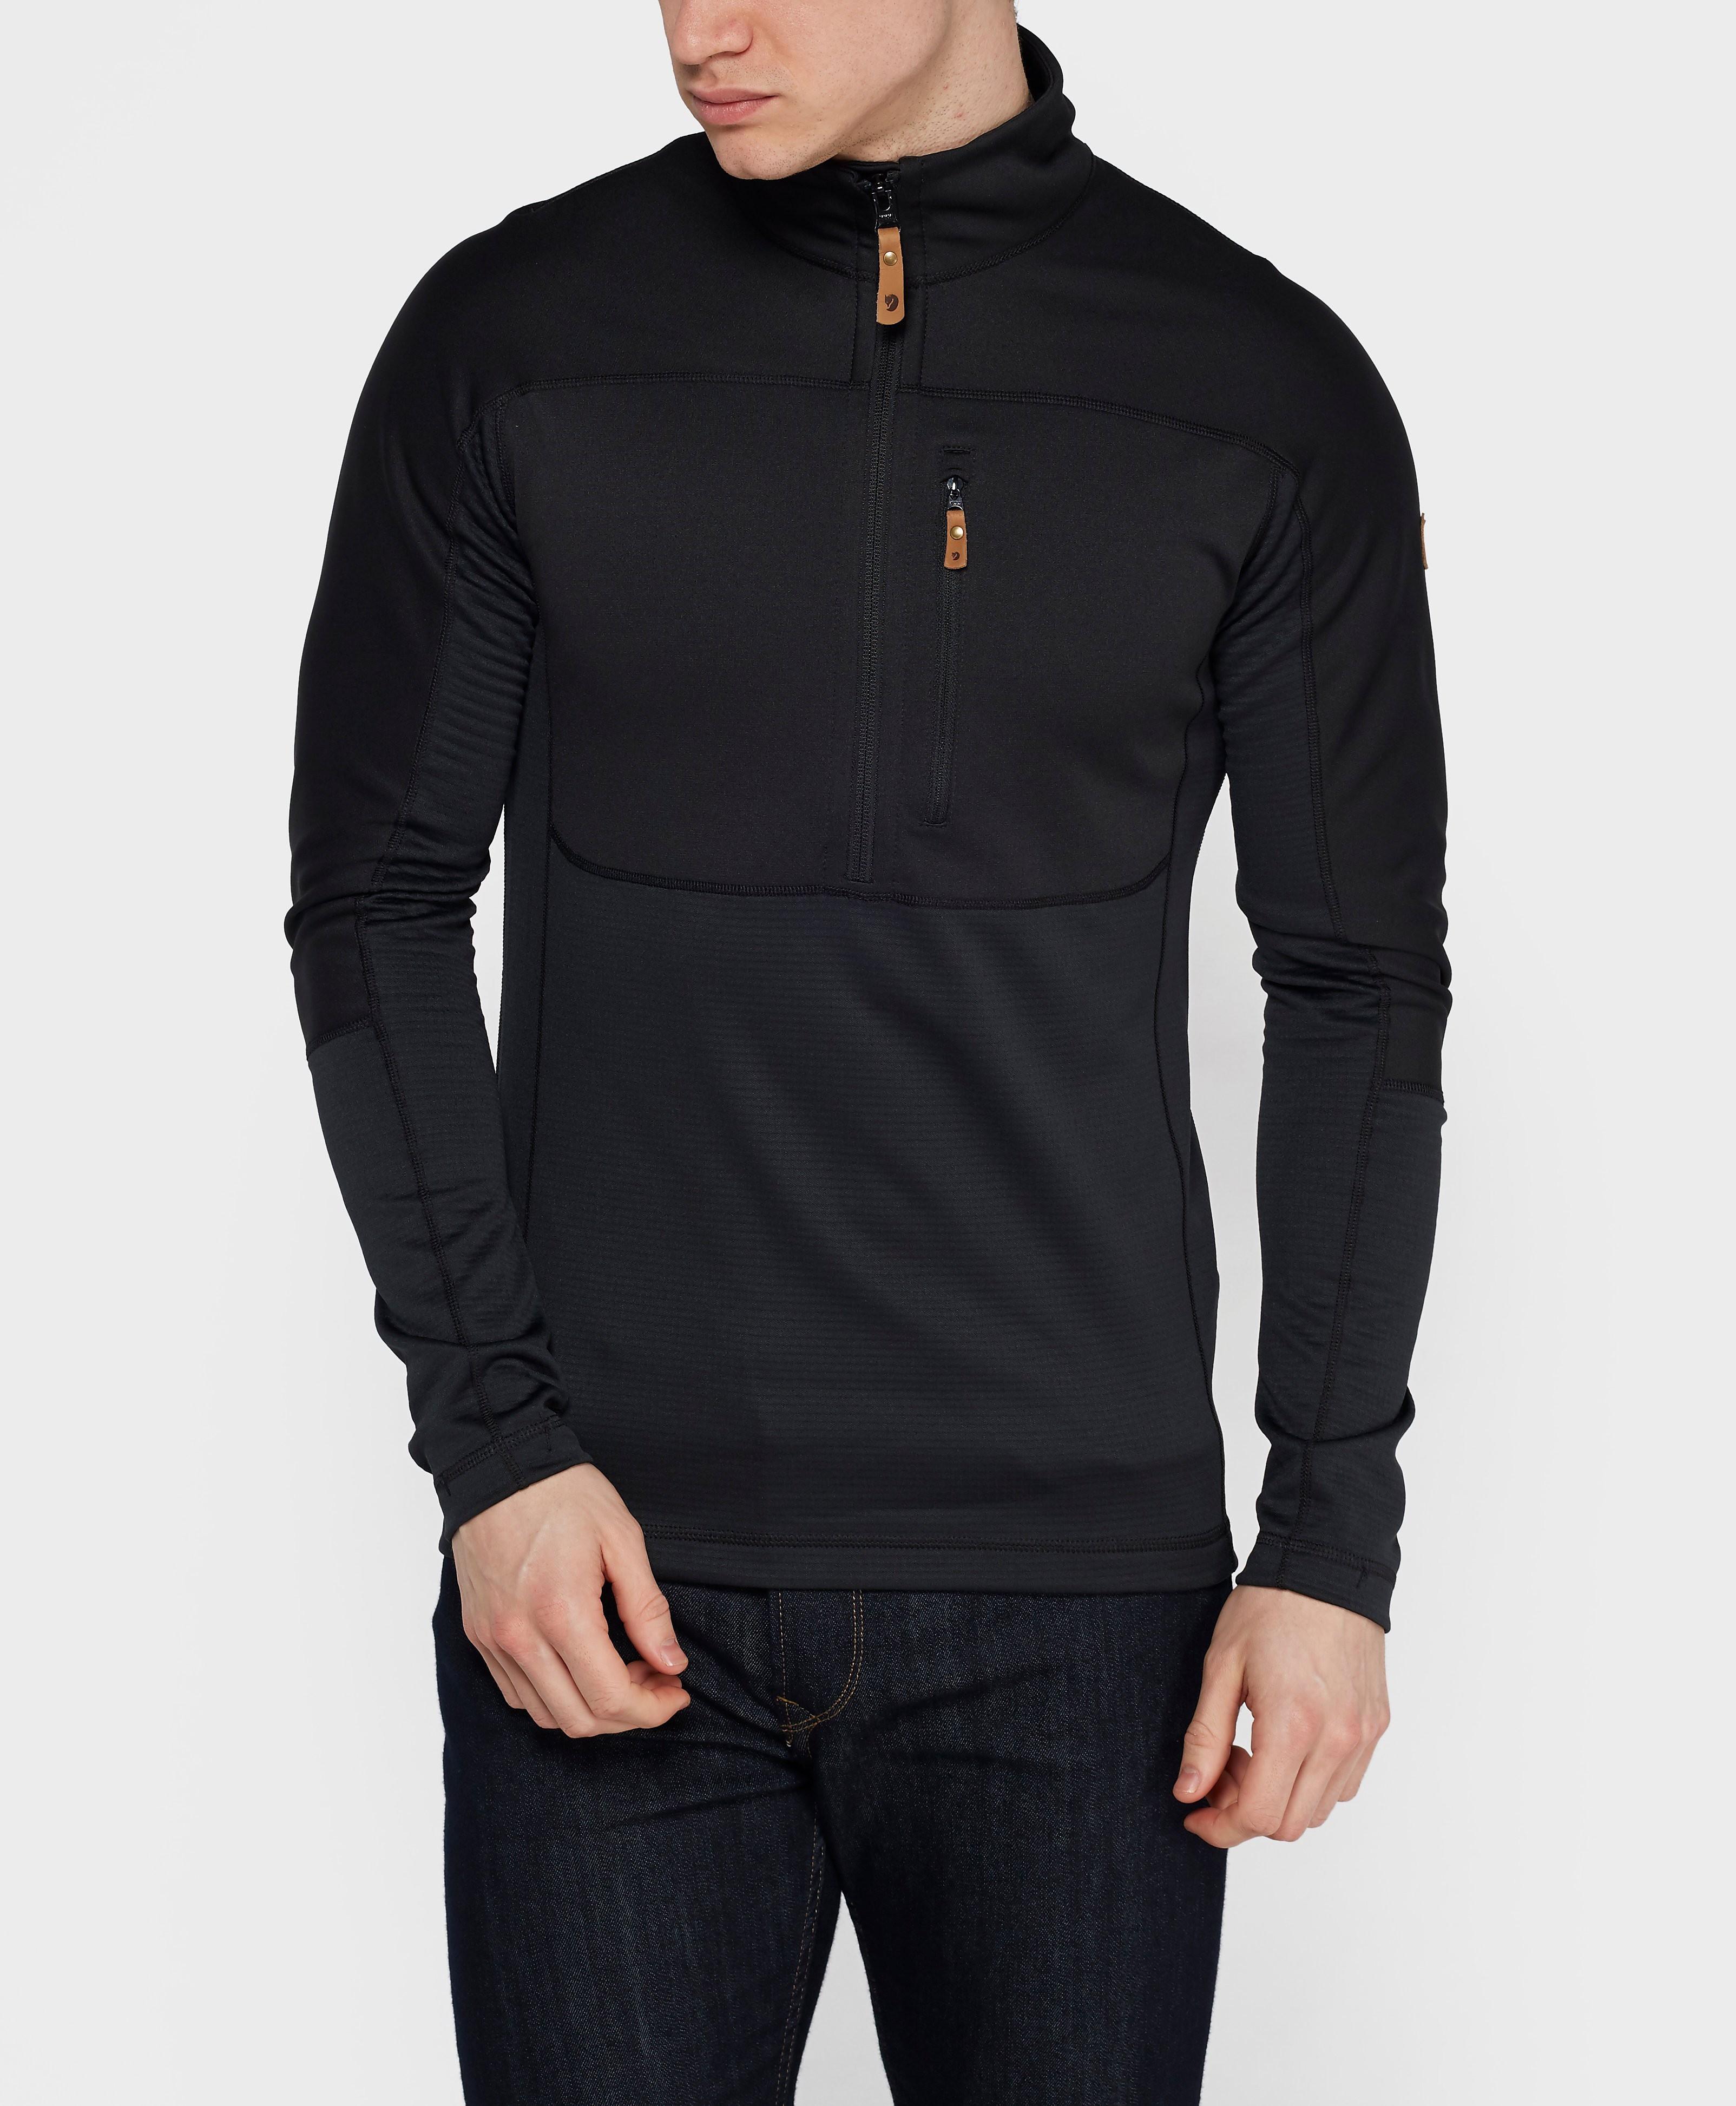 Fjallraven Abisko Trail Sweatshirt